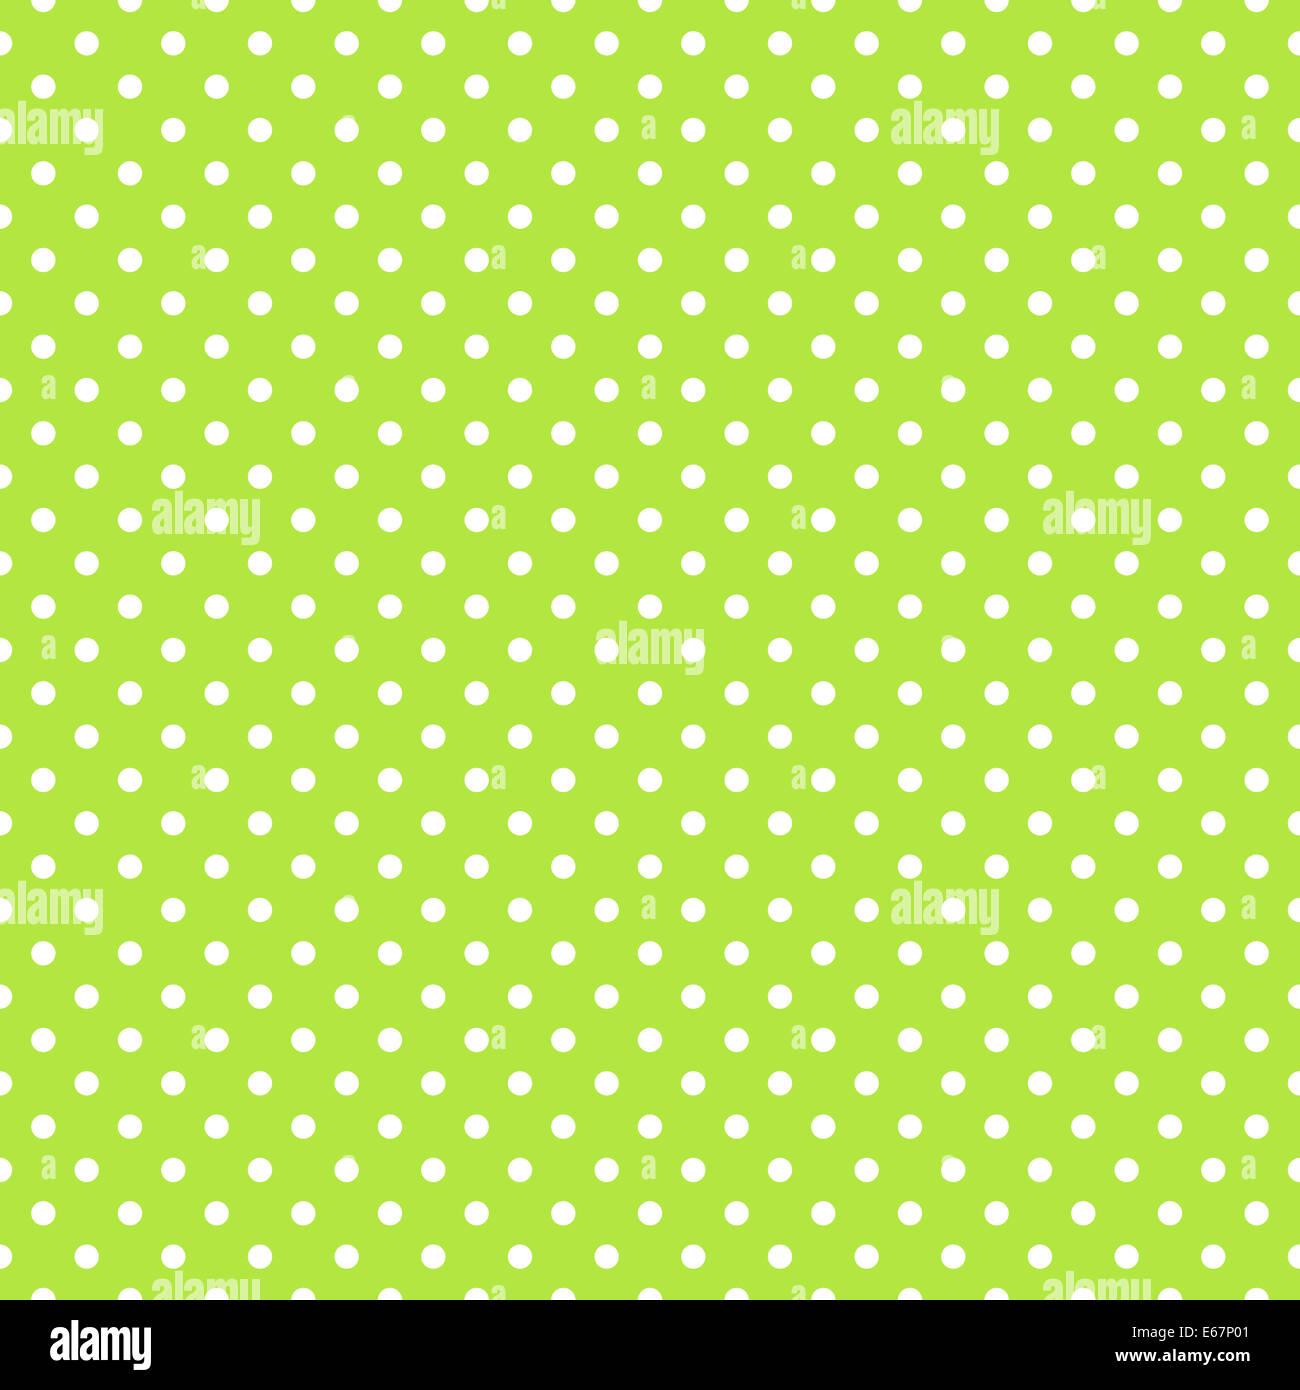 red polka dot background.html